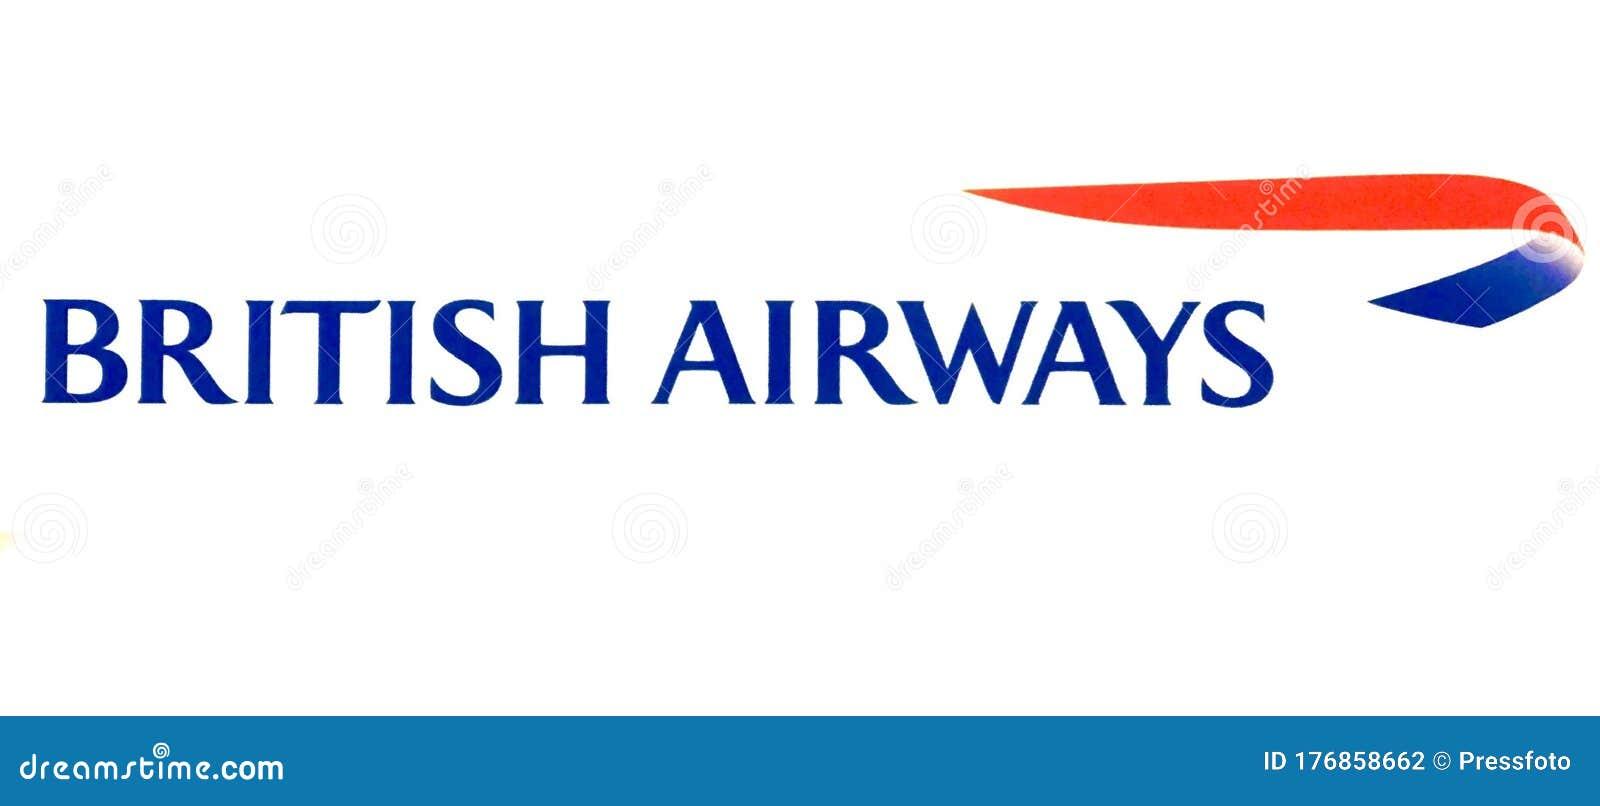 Ticket-O-Matic Is the Best Fake Flight Ticket Generator   Airline tickets,  Ticket generator, Plane tickets